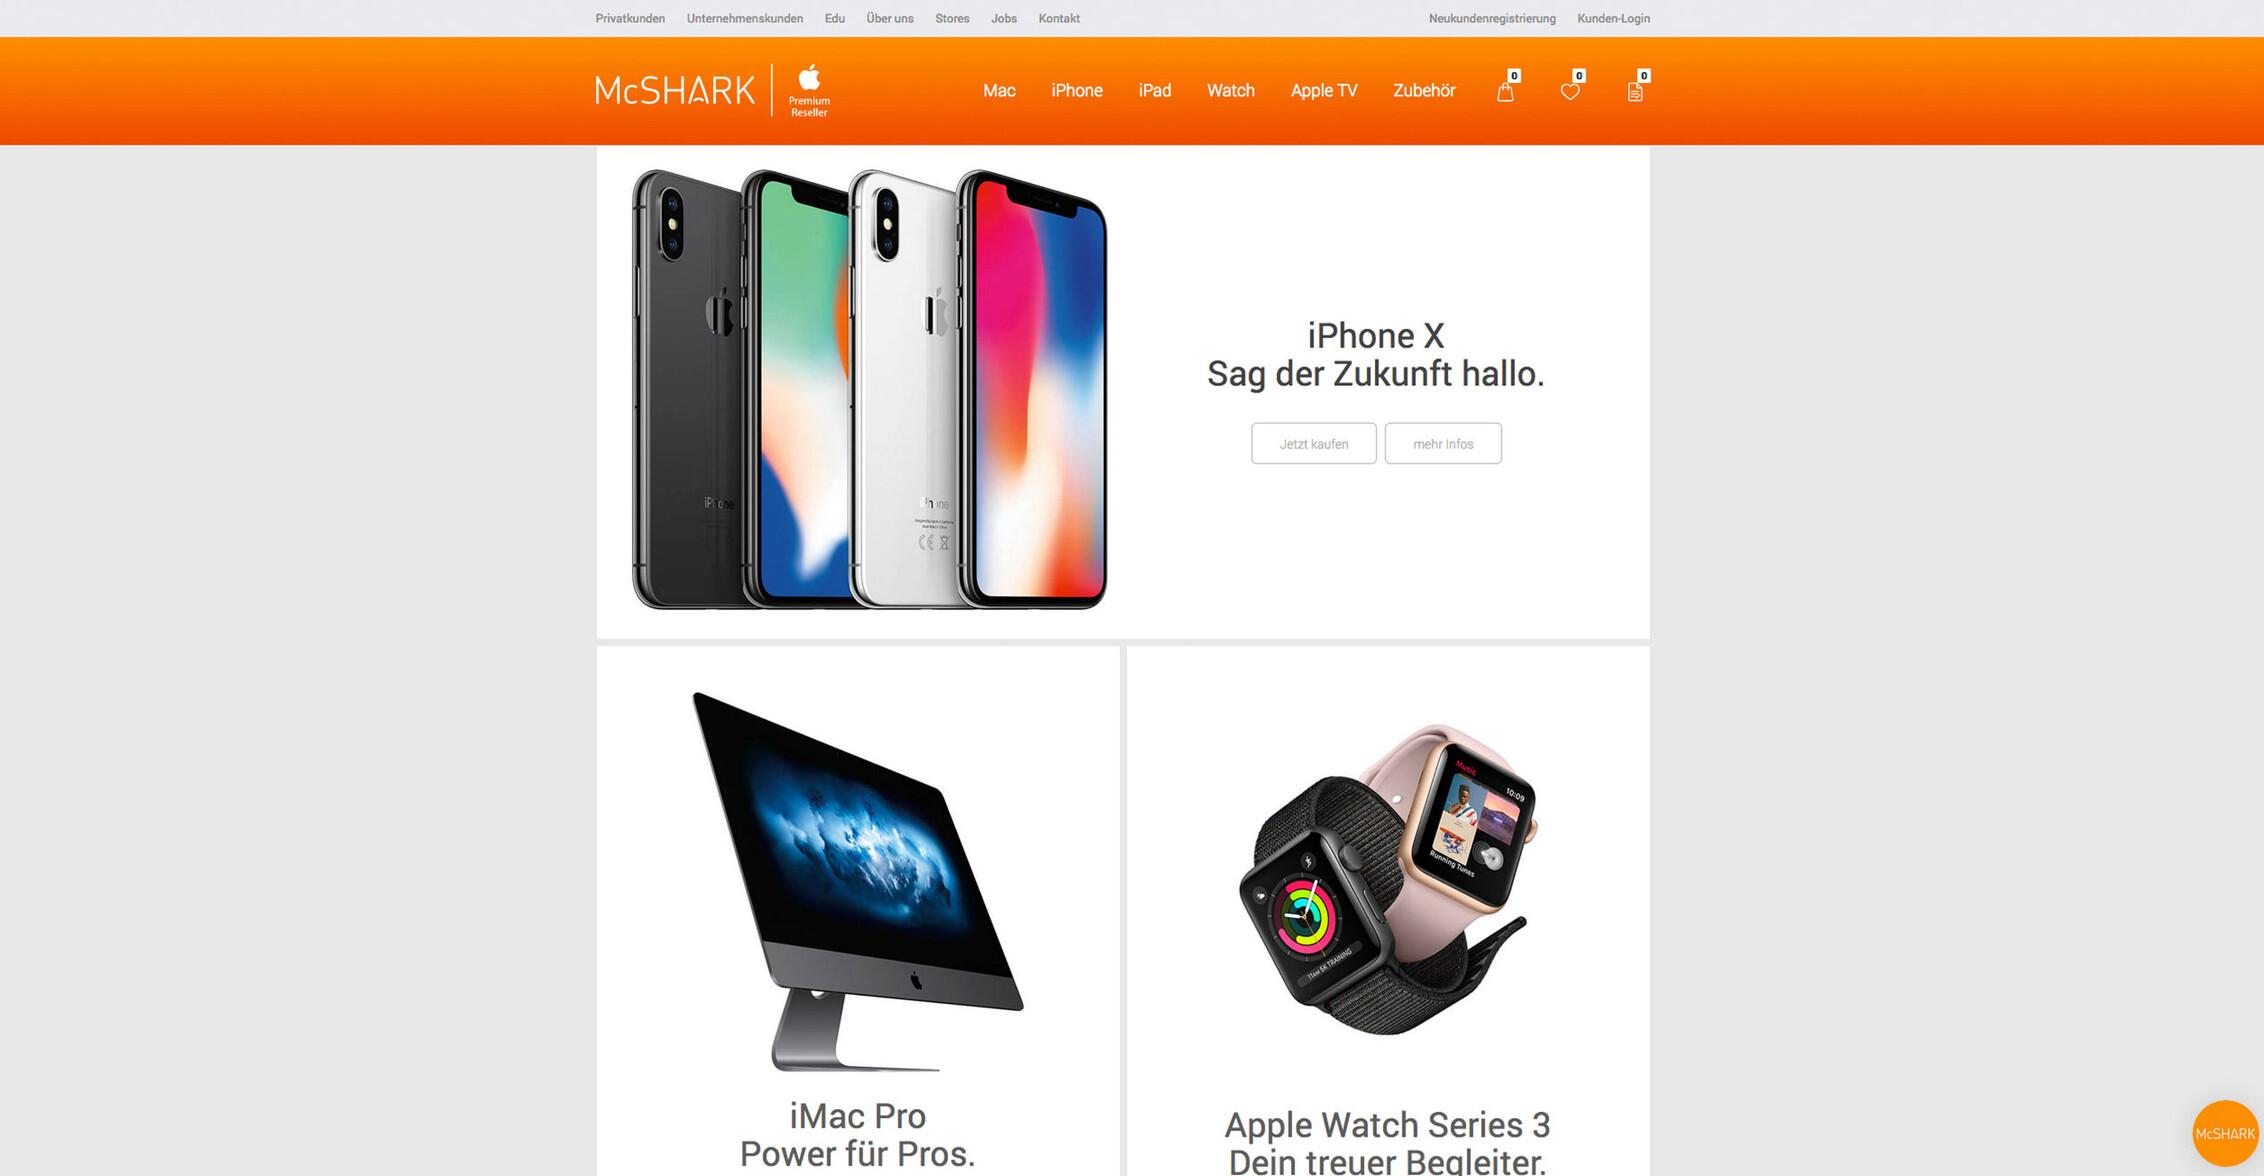 eboxx® onlineshop, apple, mcshark, startseite